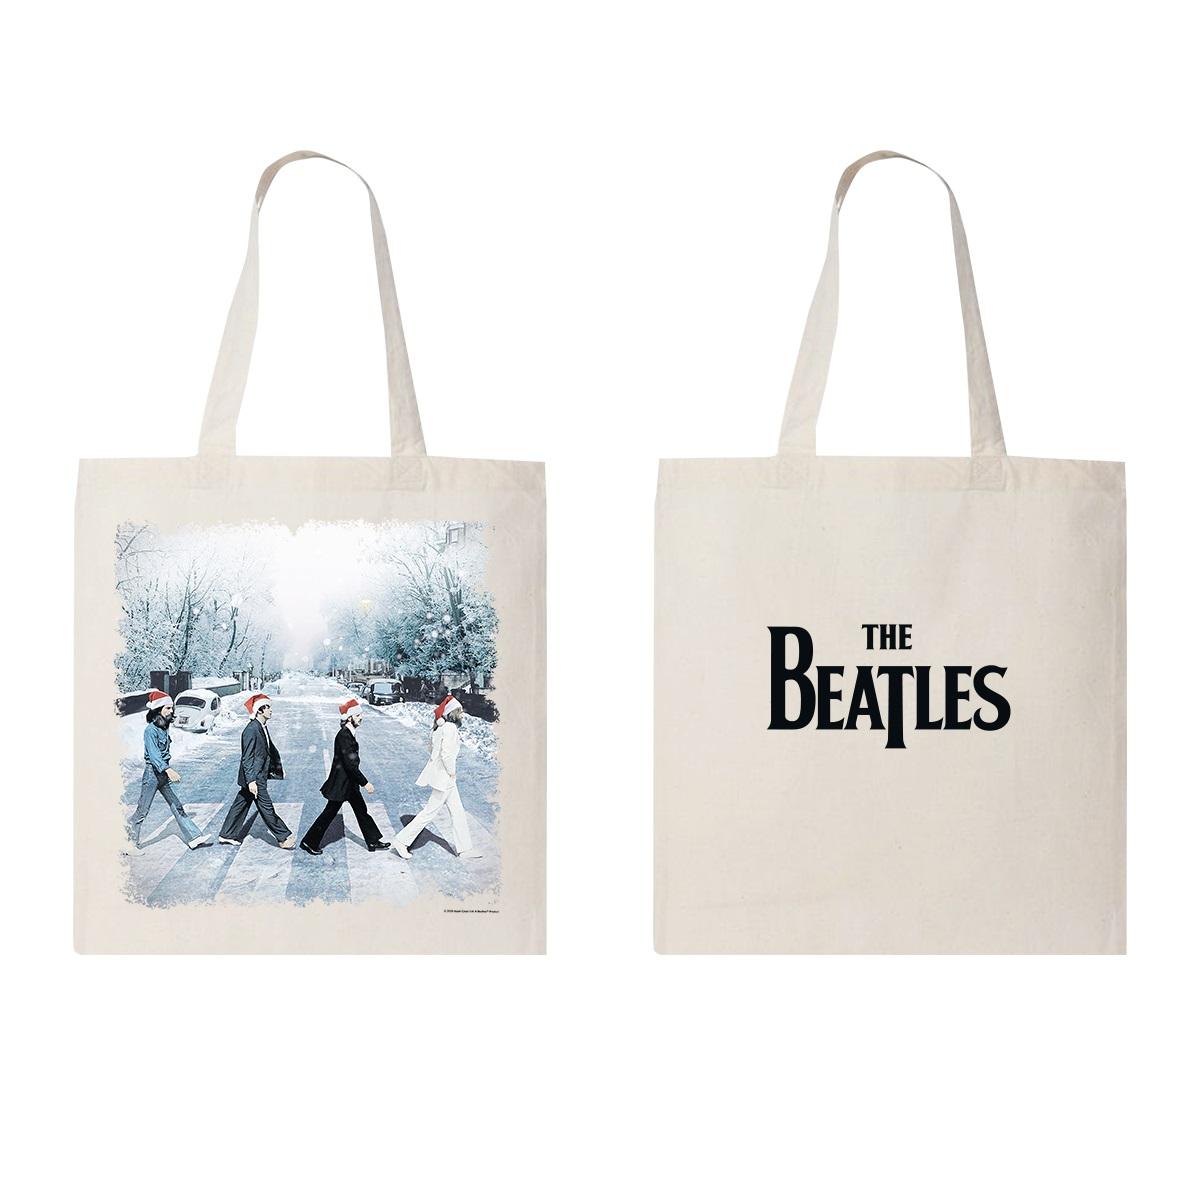 Snowy Abbey Road Tote Bag